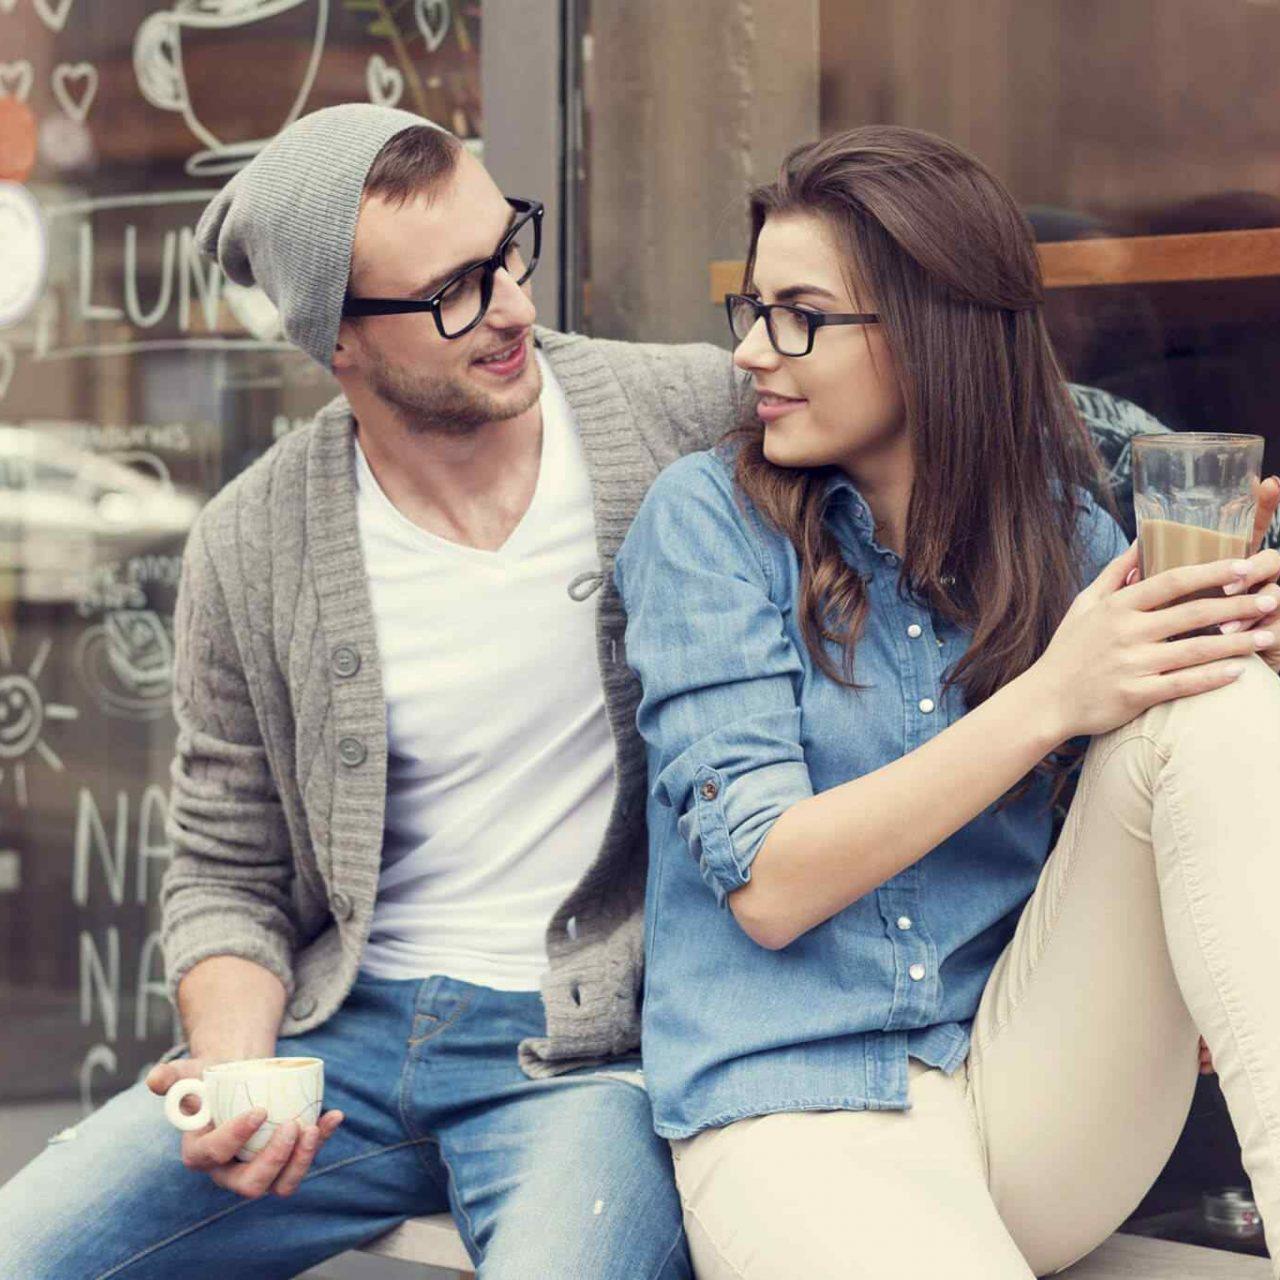 https://kimlevincoaching.com/wp-content/uploads/2018/01/img-class-marriage-02-1280x1280.jpg